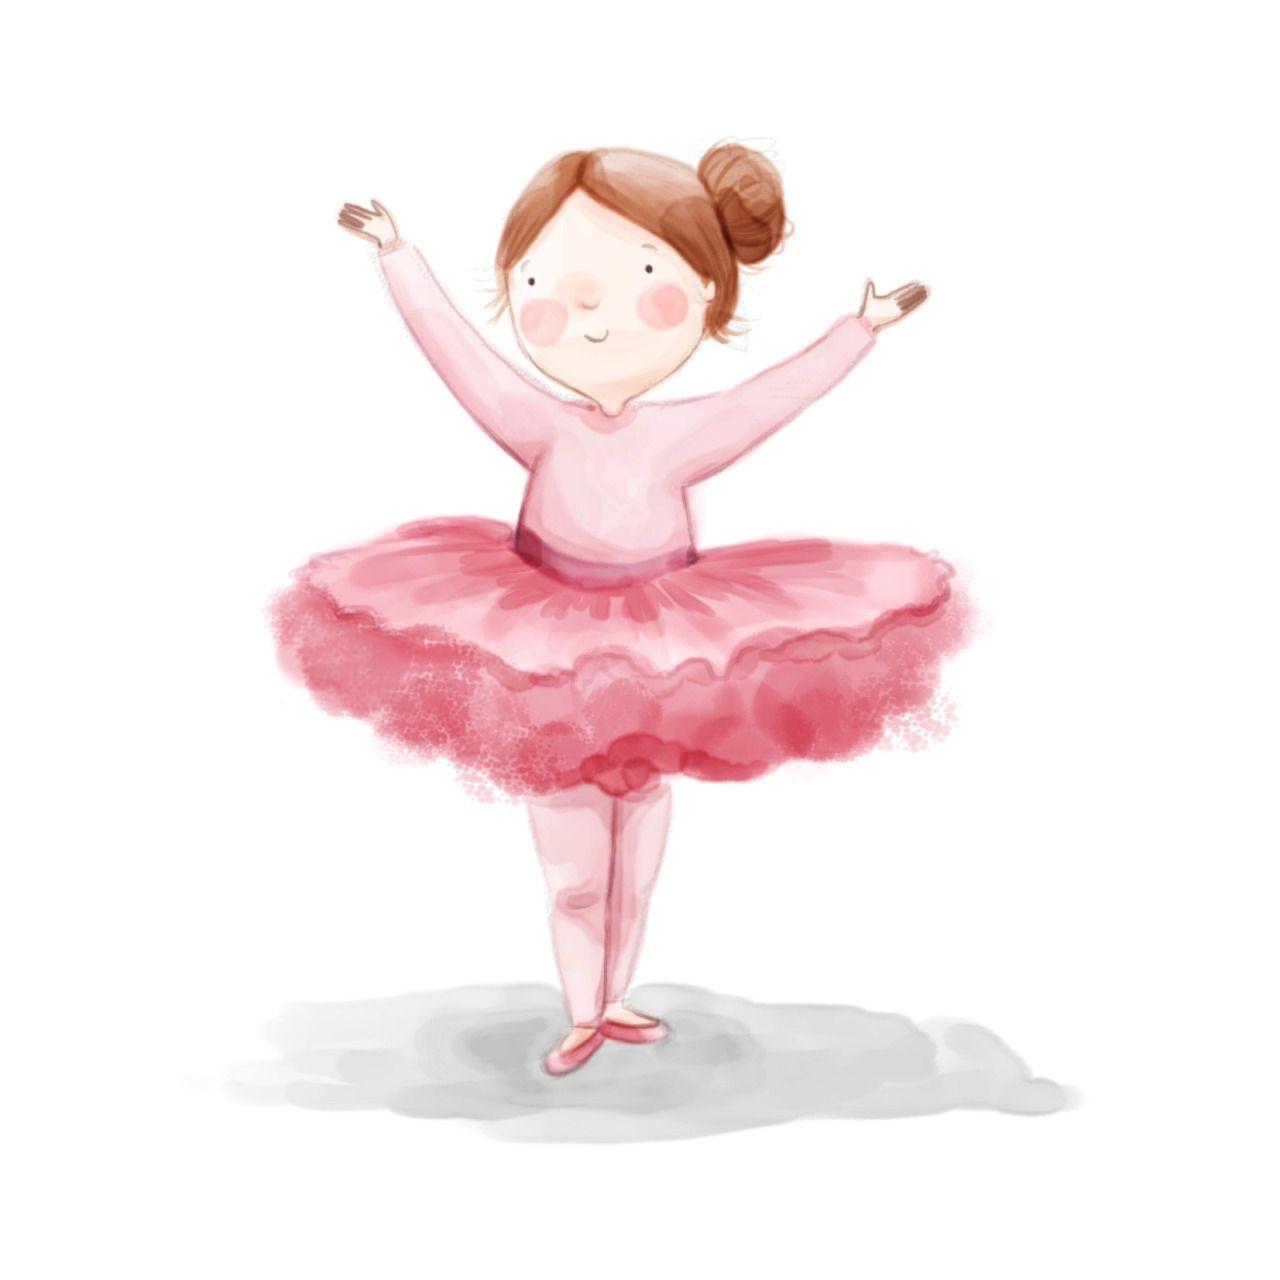 Картинка балерина для детей на прозрачном